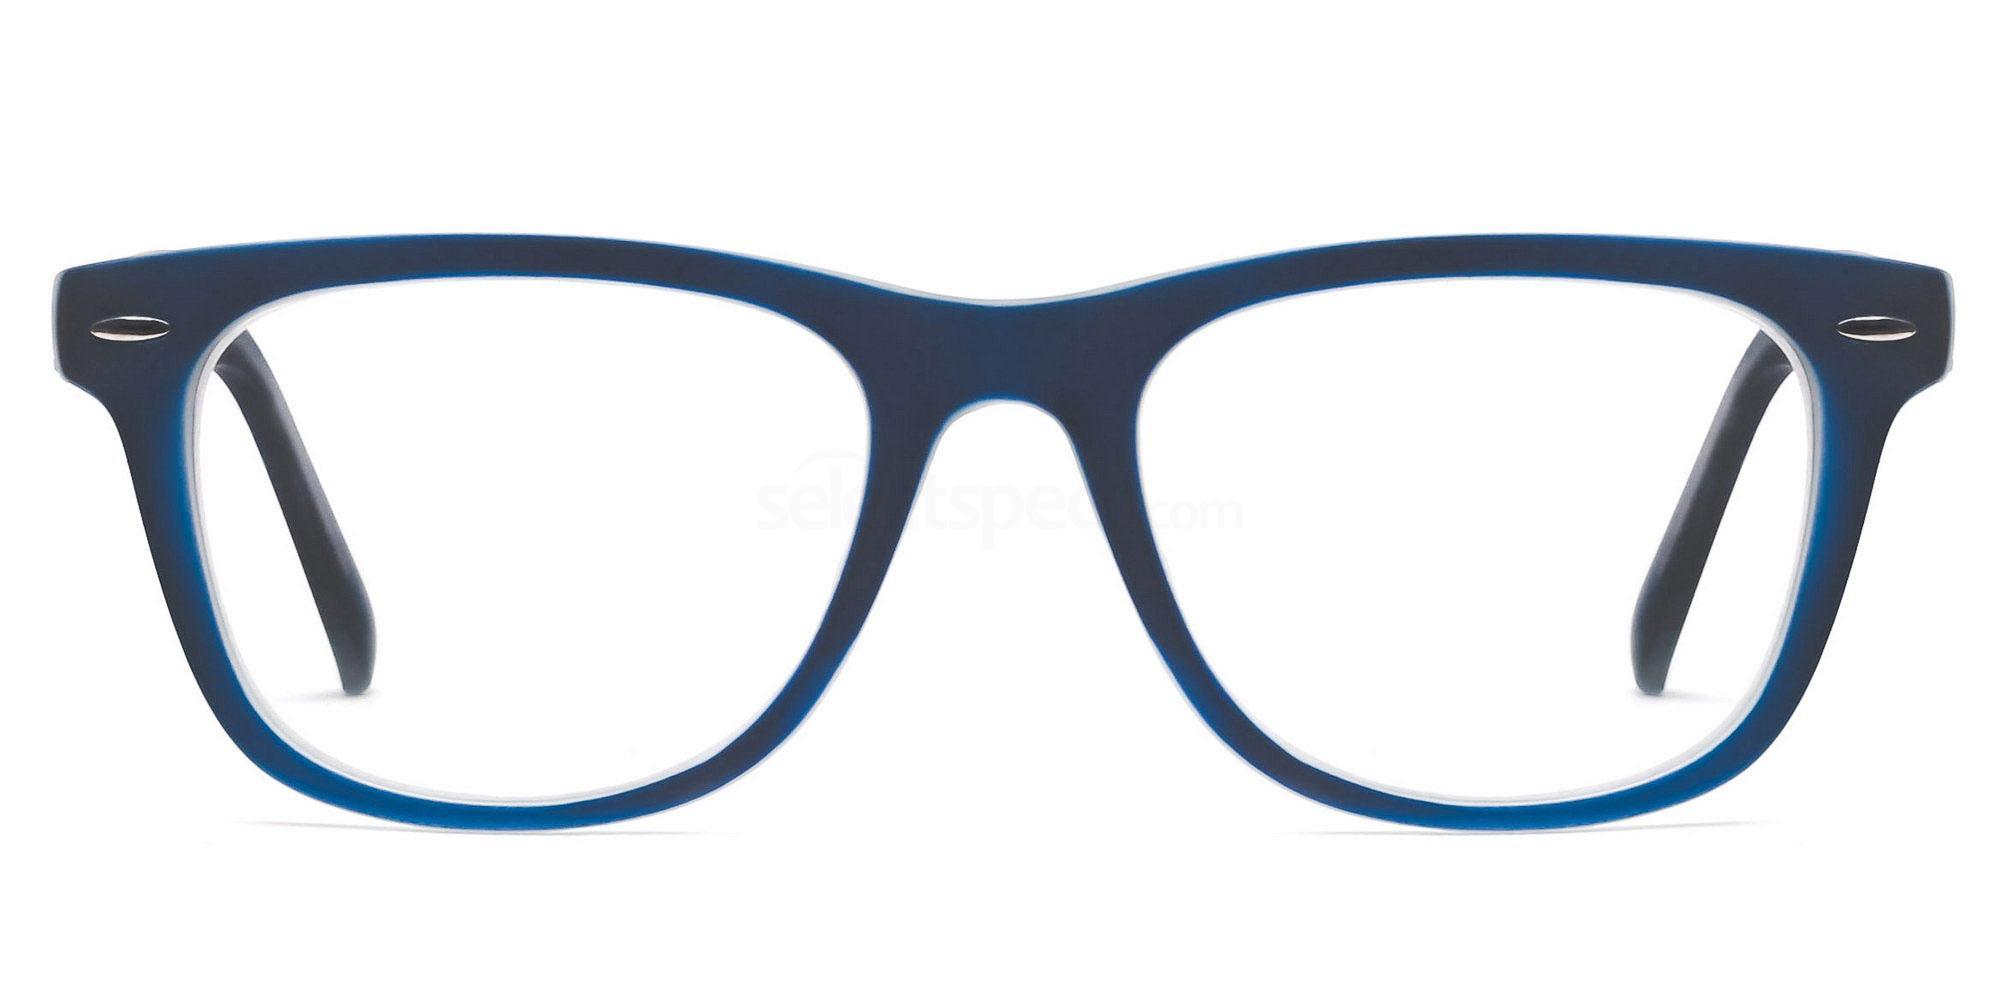 C14 8121 - Navy on Transparent Glasses, Savannah